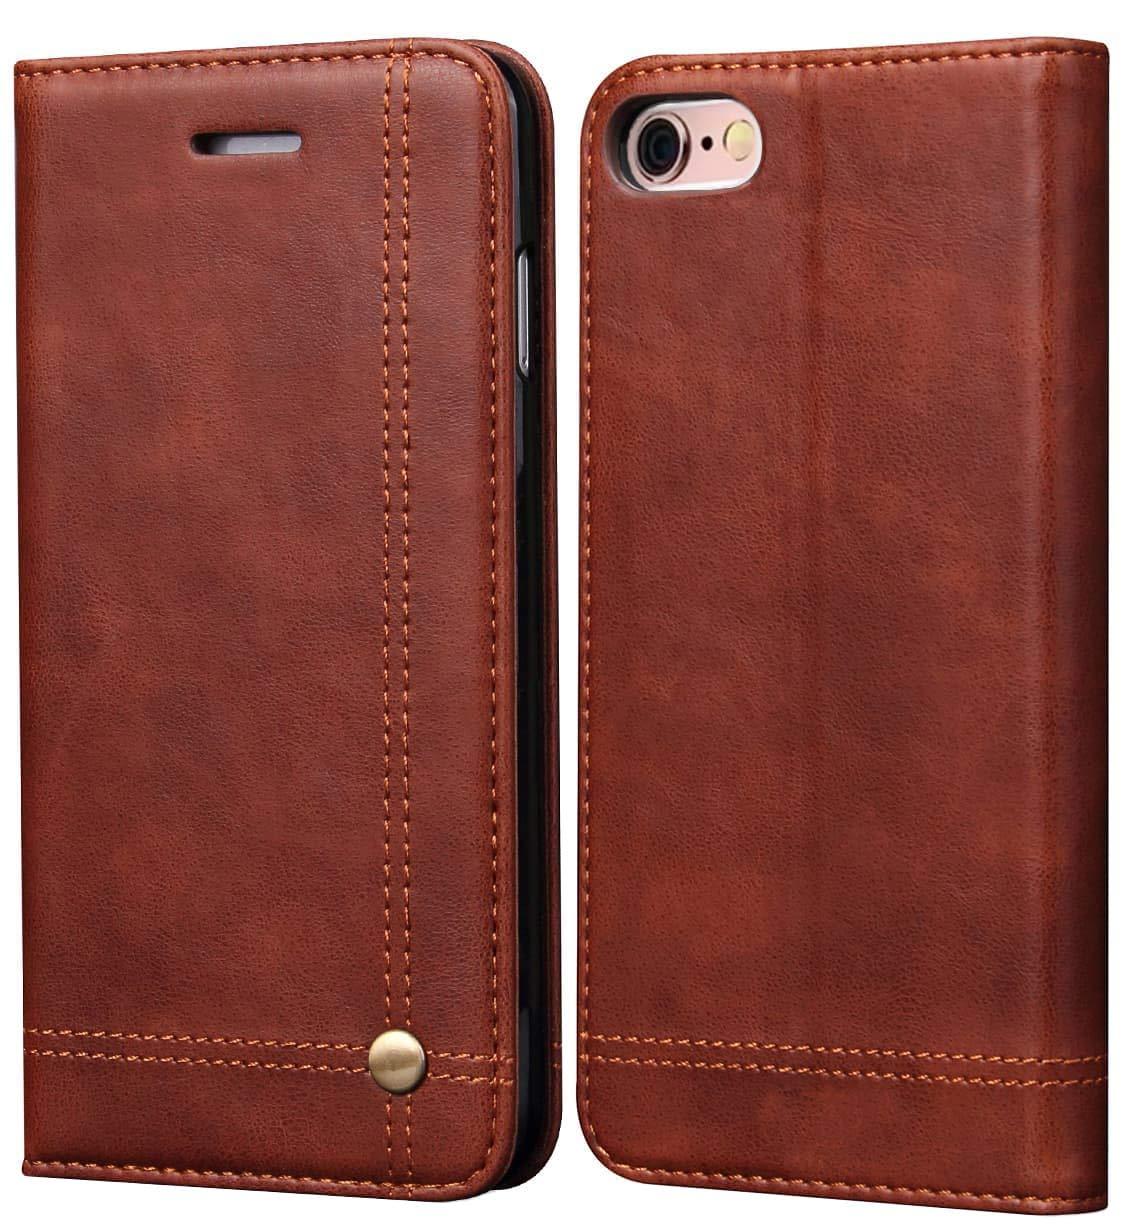 SINIANL iPhone 6S Plus Case iPhone 6 Plus Case, Leather Wallet Case Magnetic Closure with Kikstand & Card Slot Flip Cover for iPhone 6 Plus / 6S Plus